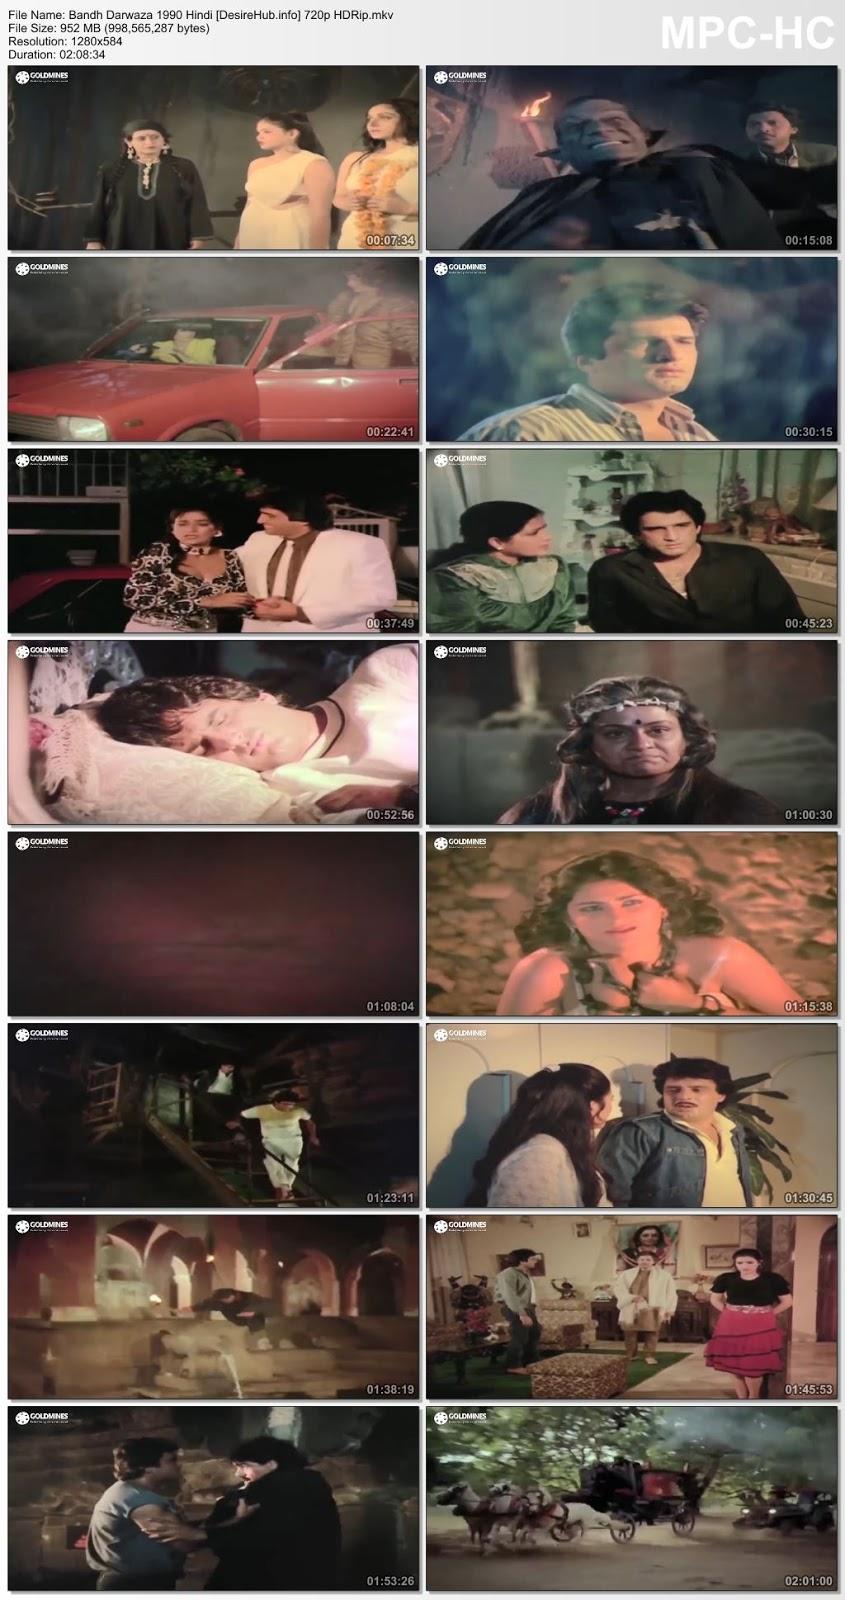 Bandh Darwaza 1990 Hindi 720p HDRip 950MB Desirehub